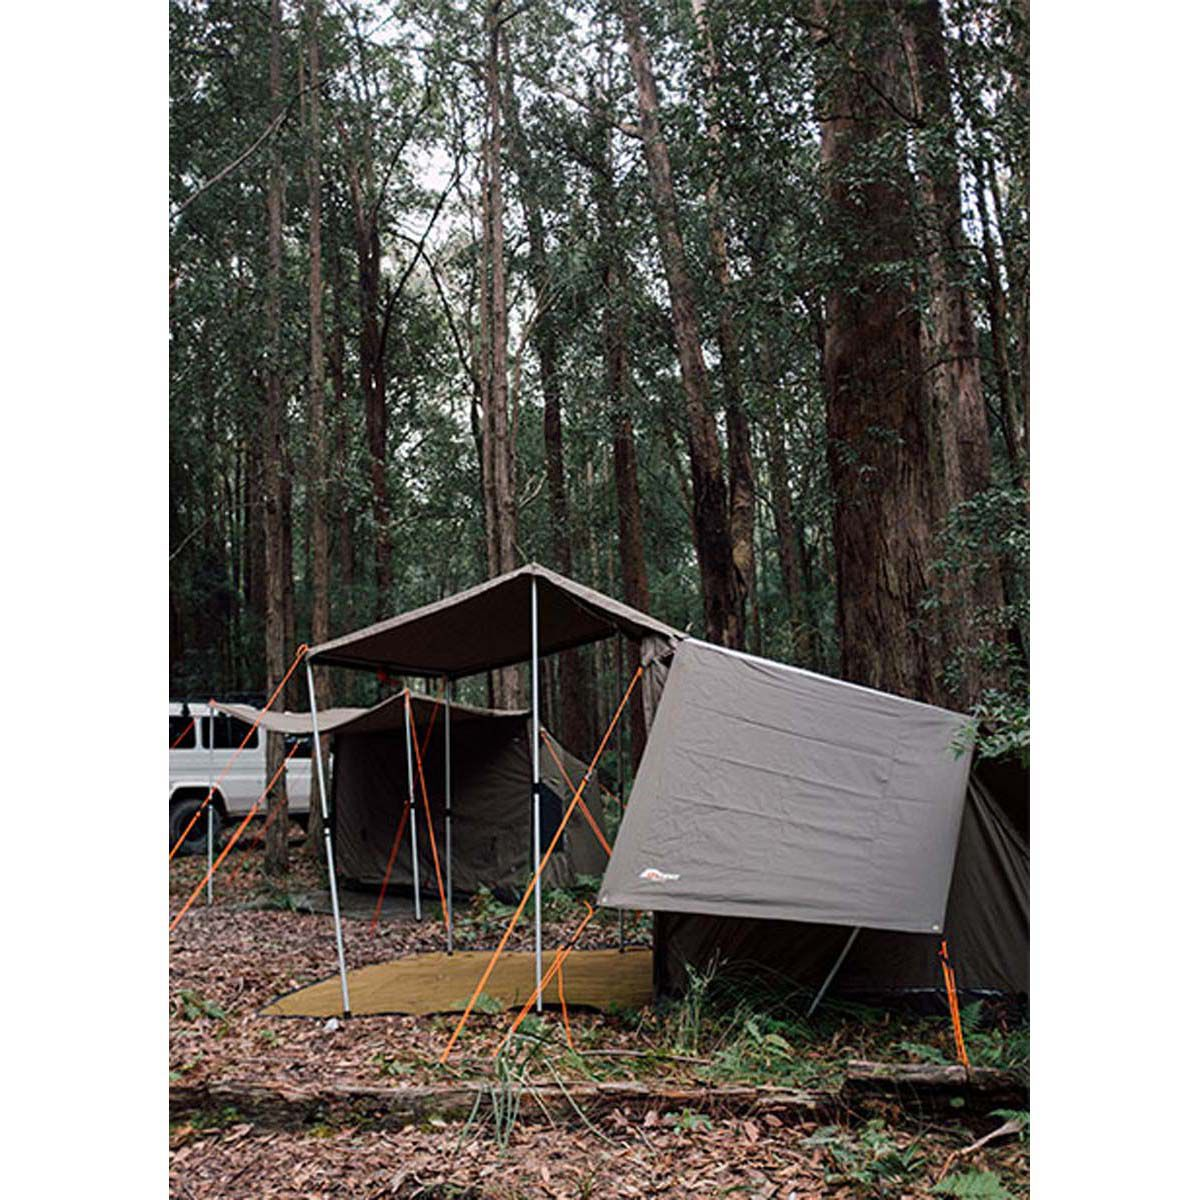 Oztent RV5 Touring Tent 5 Person  bcf_hi-res  sc 1 st  BCF & Oztent RV5 Touring Tent 5 Person | BCF